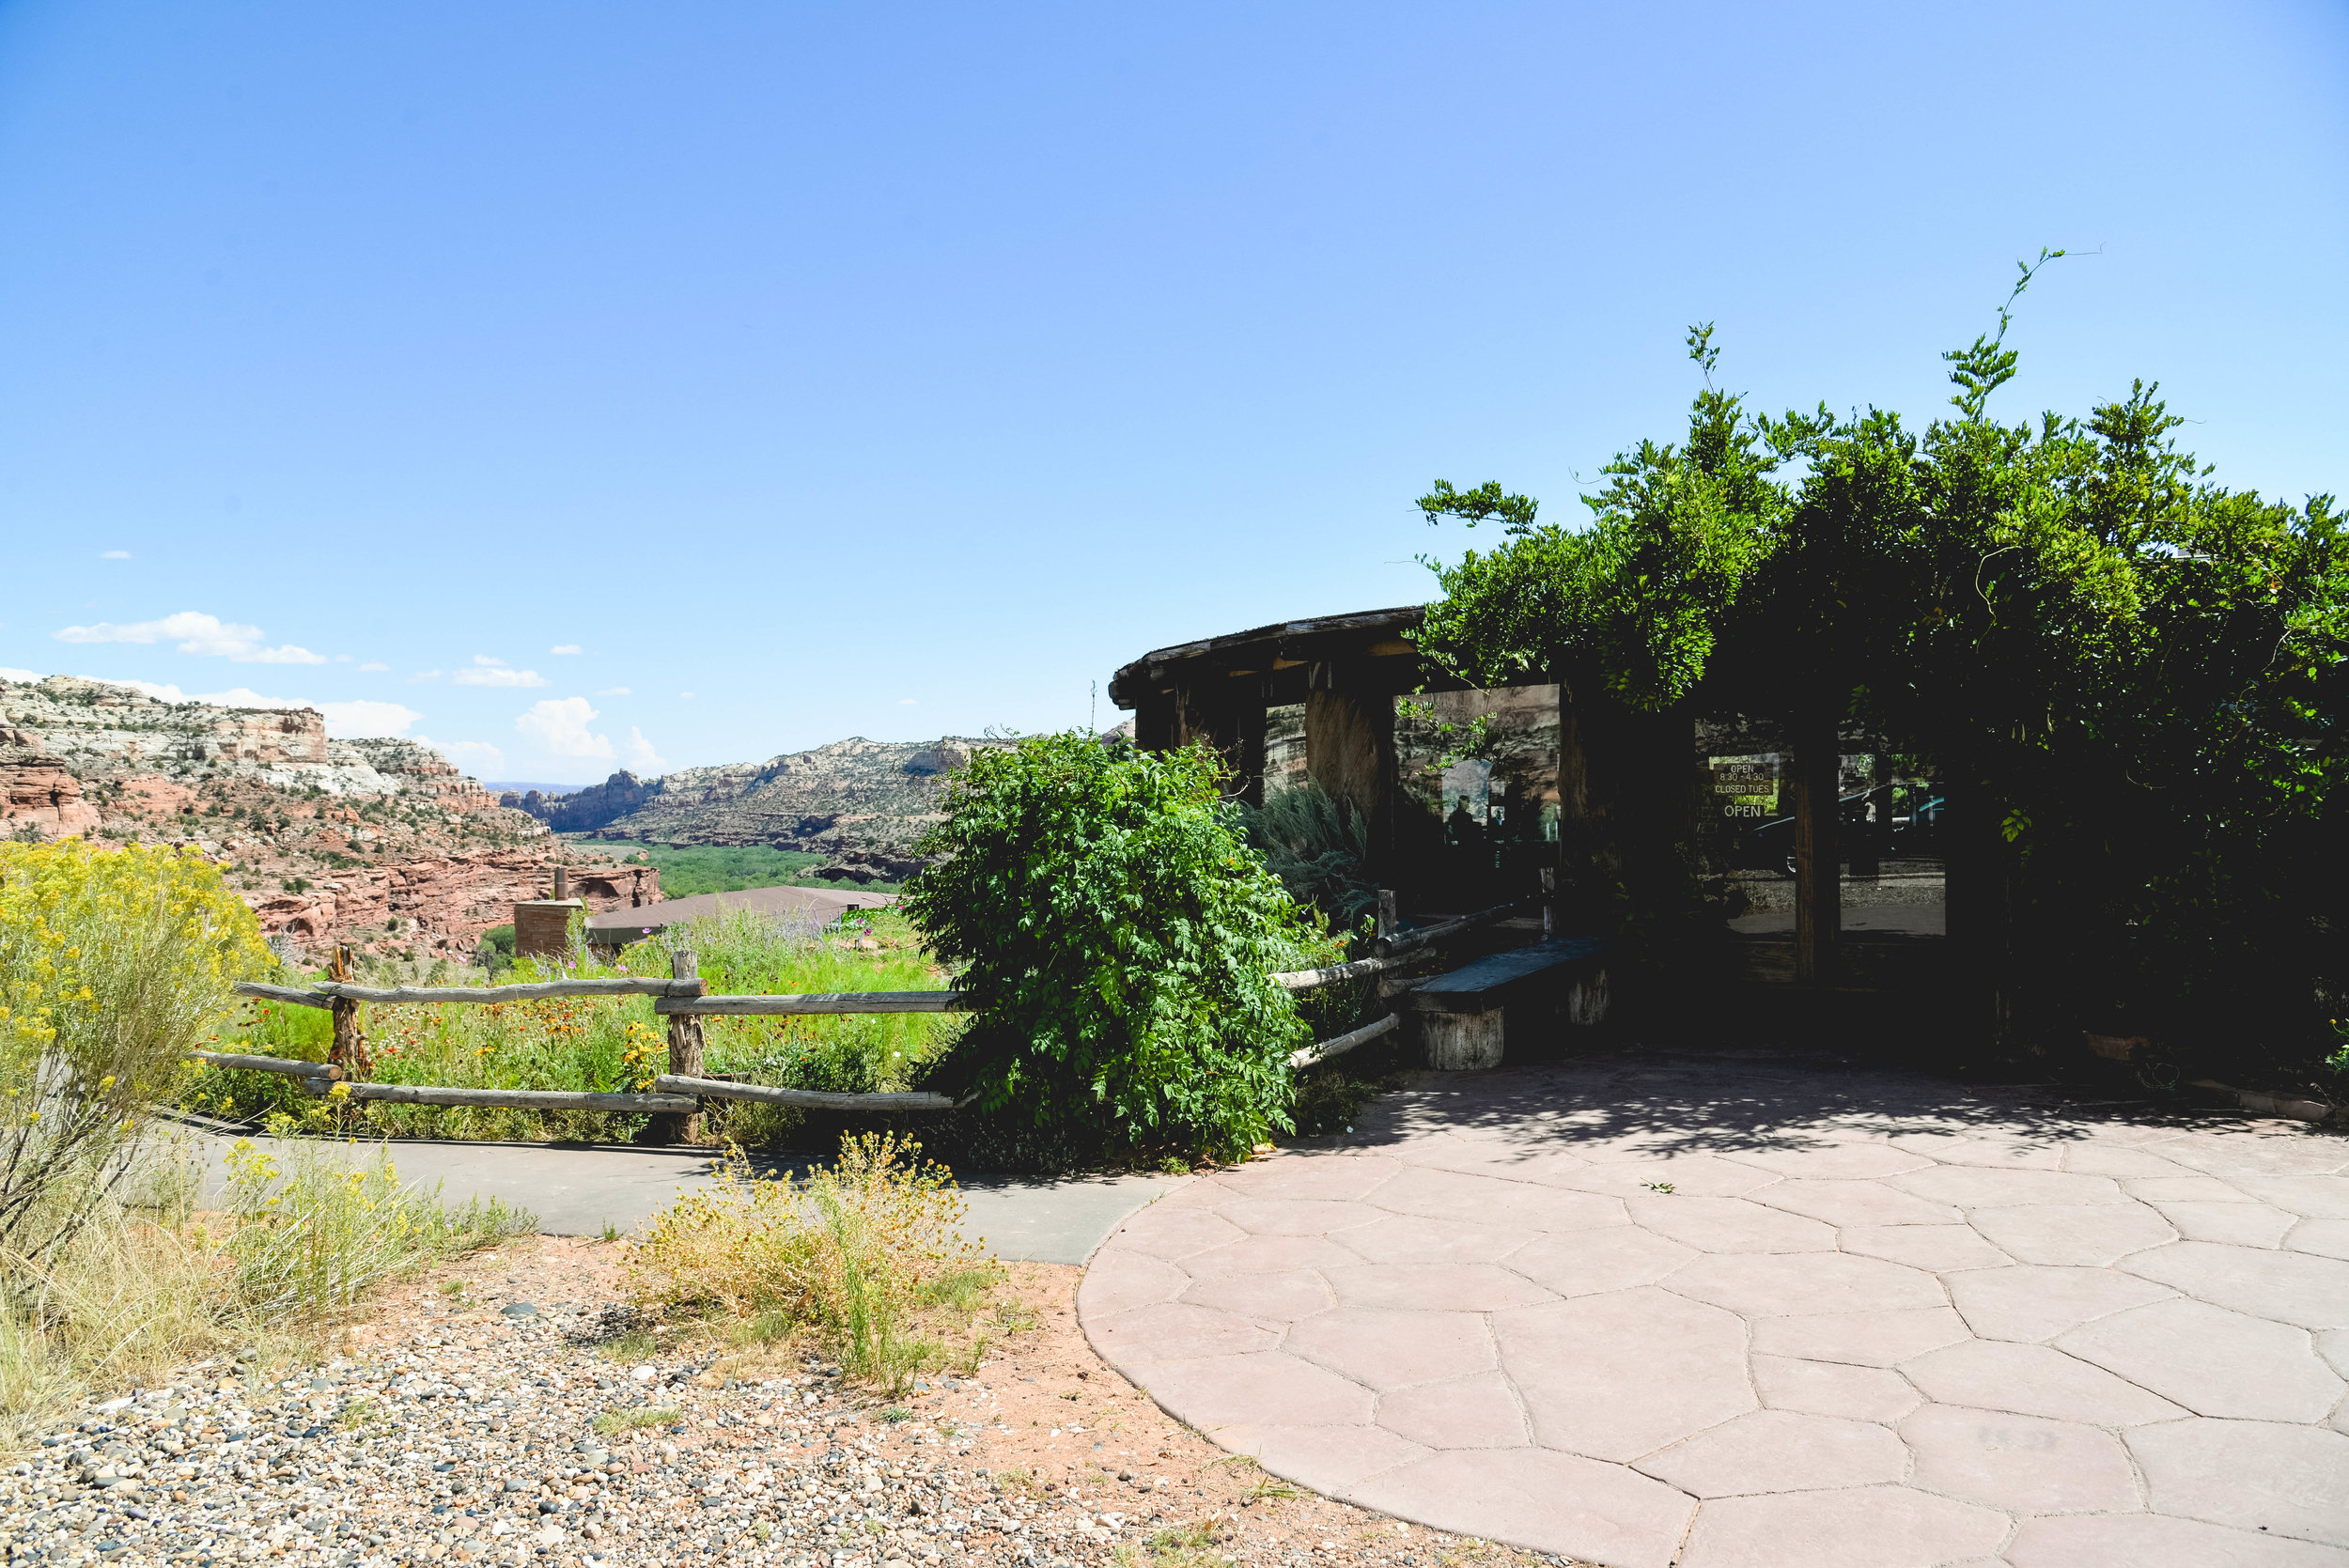 Kiva Coffee House, Escalante Utah